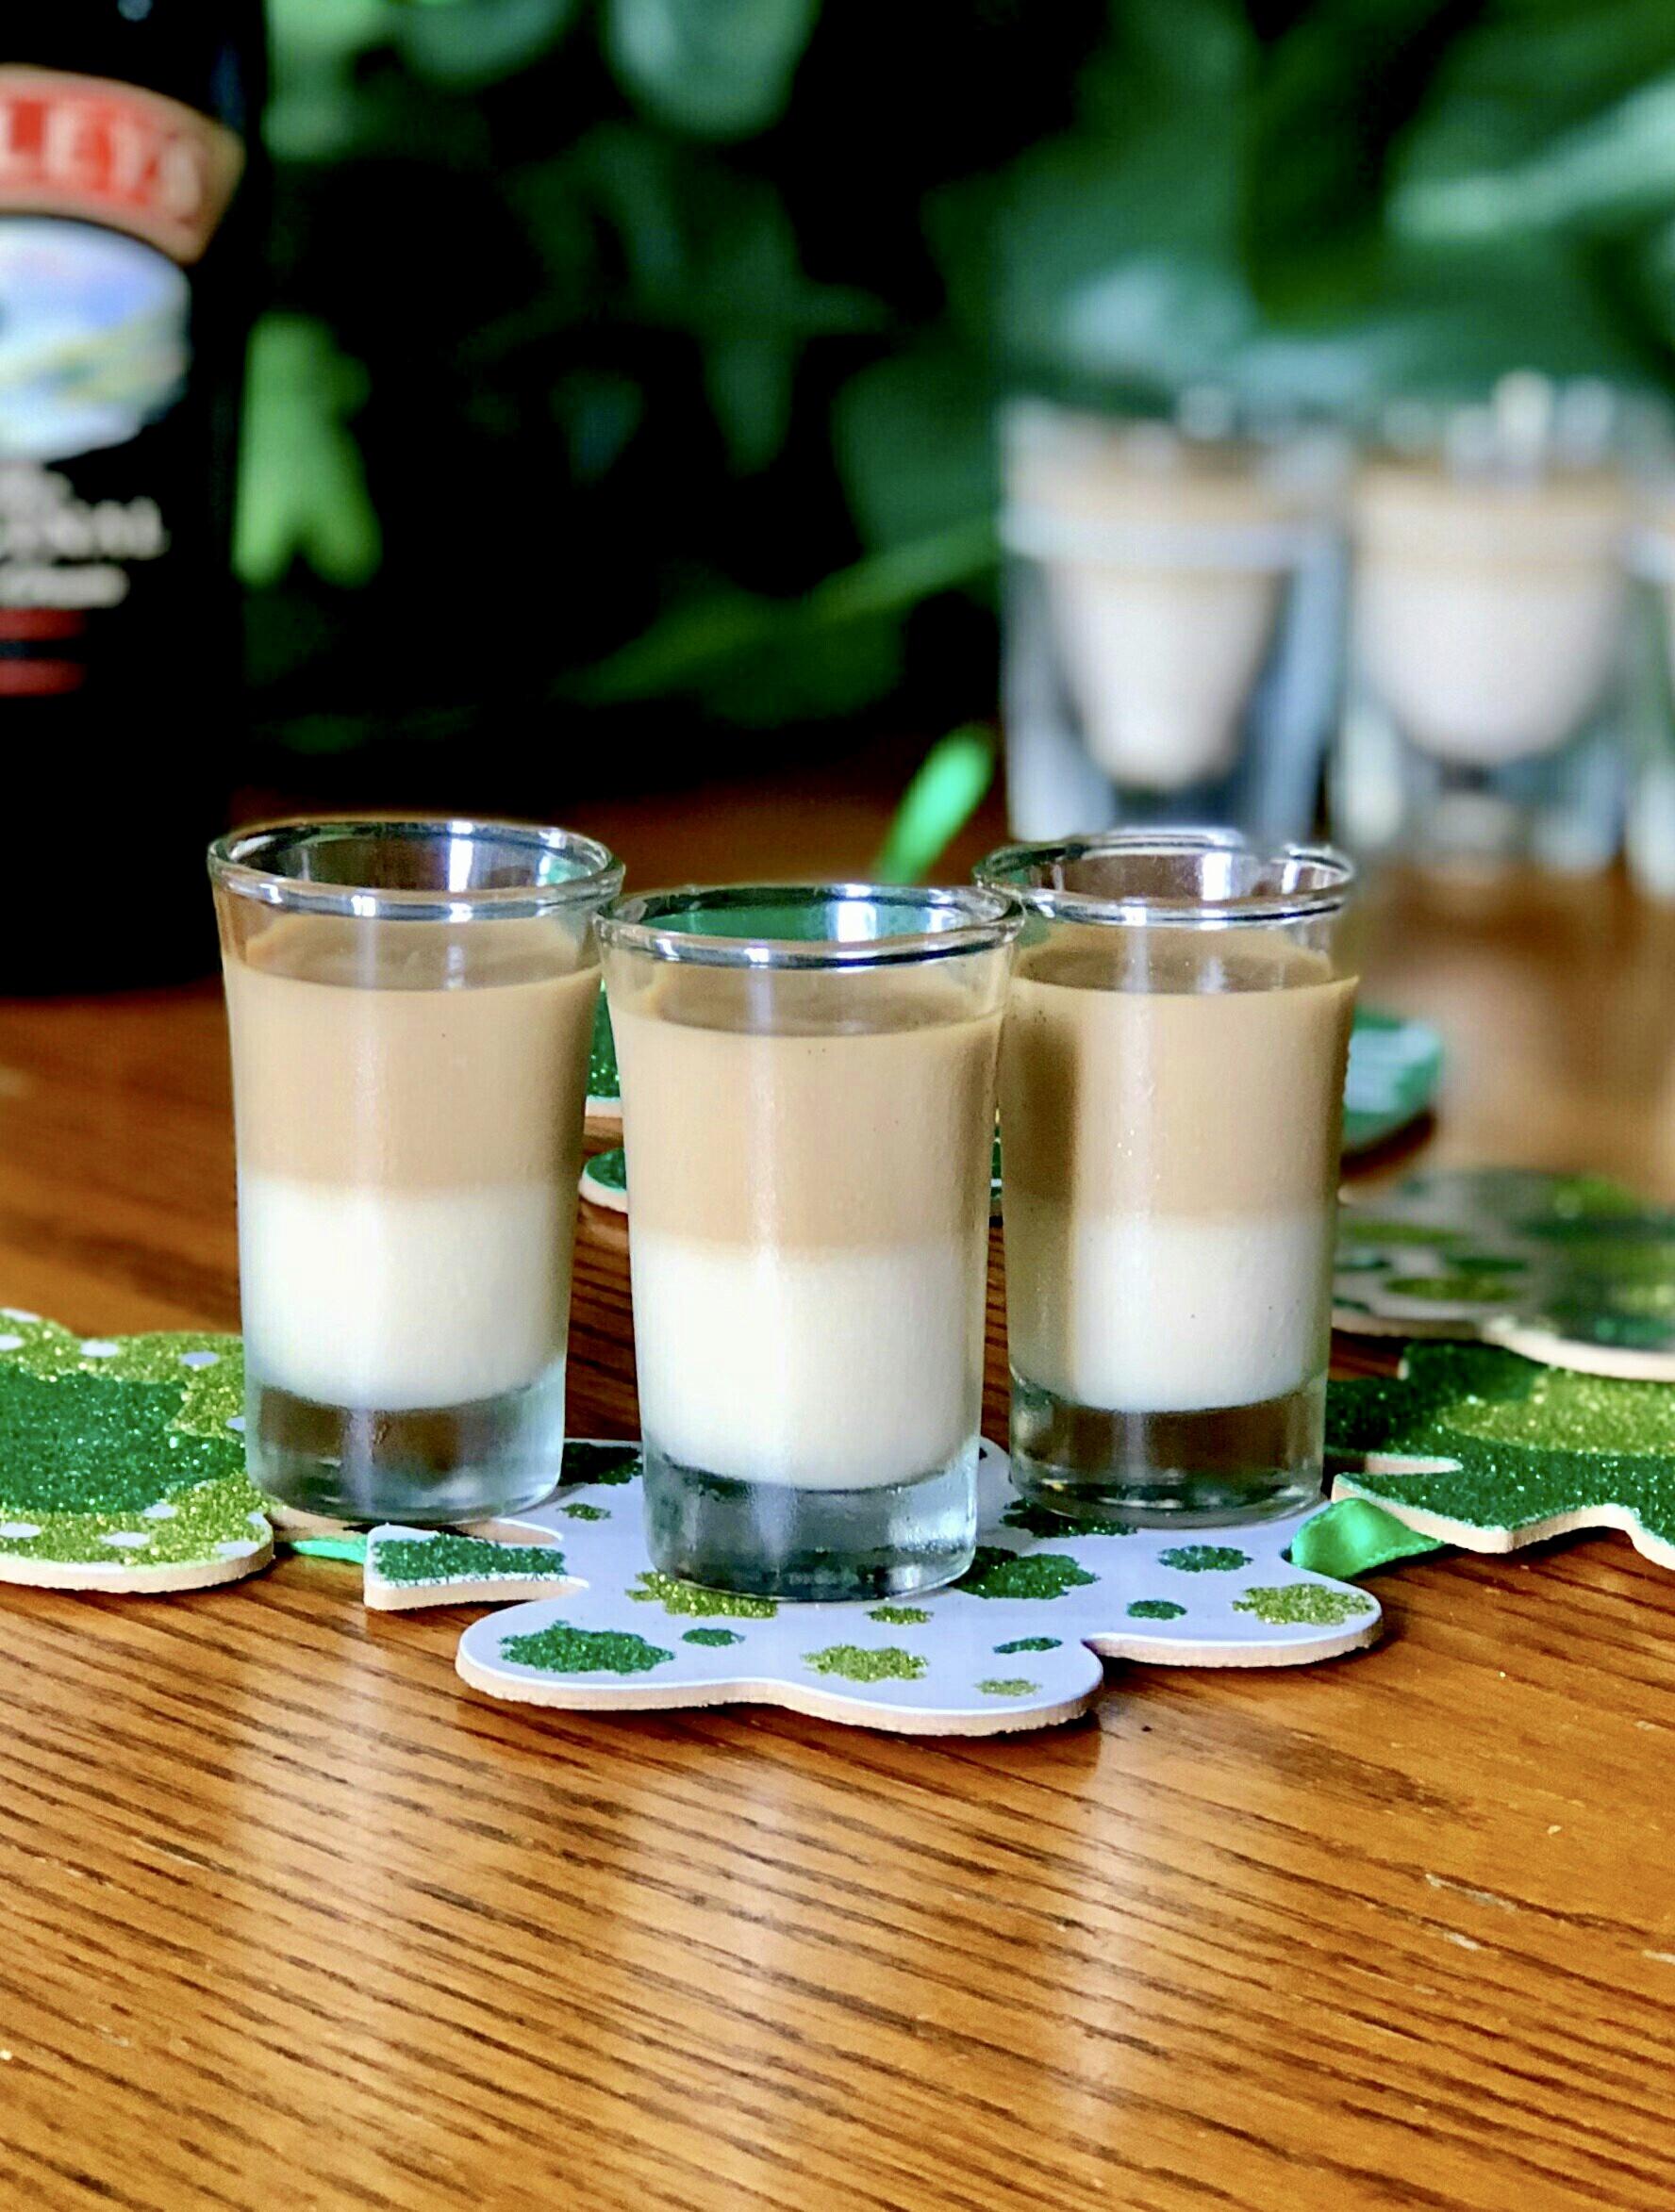 Baileys(R) and Coffee Jell-O(R) Shots